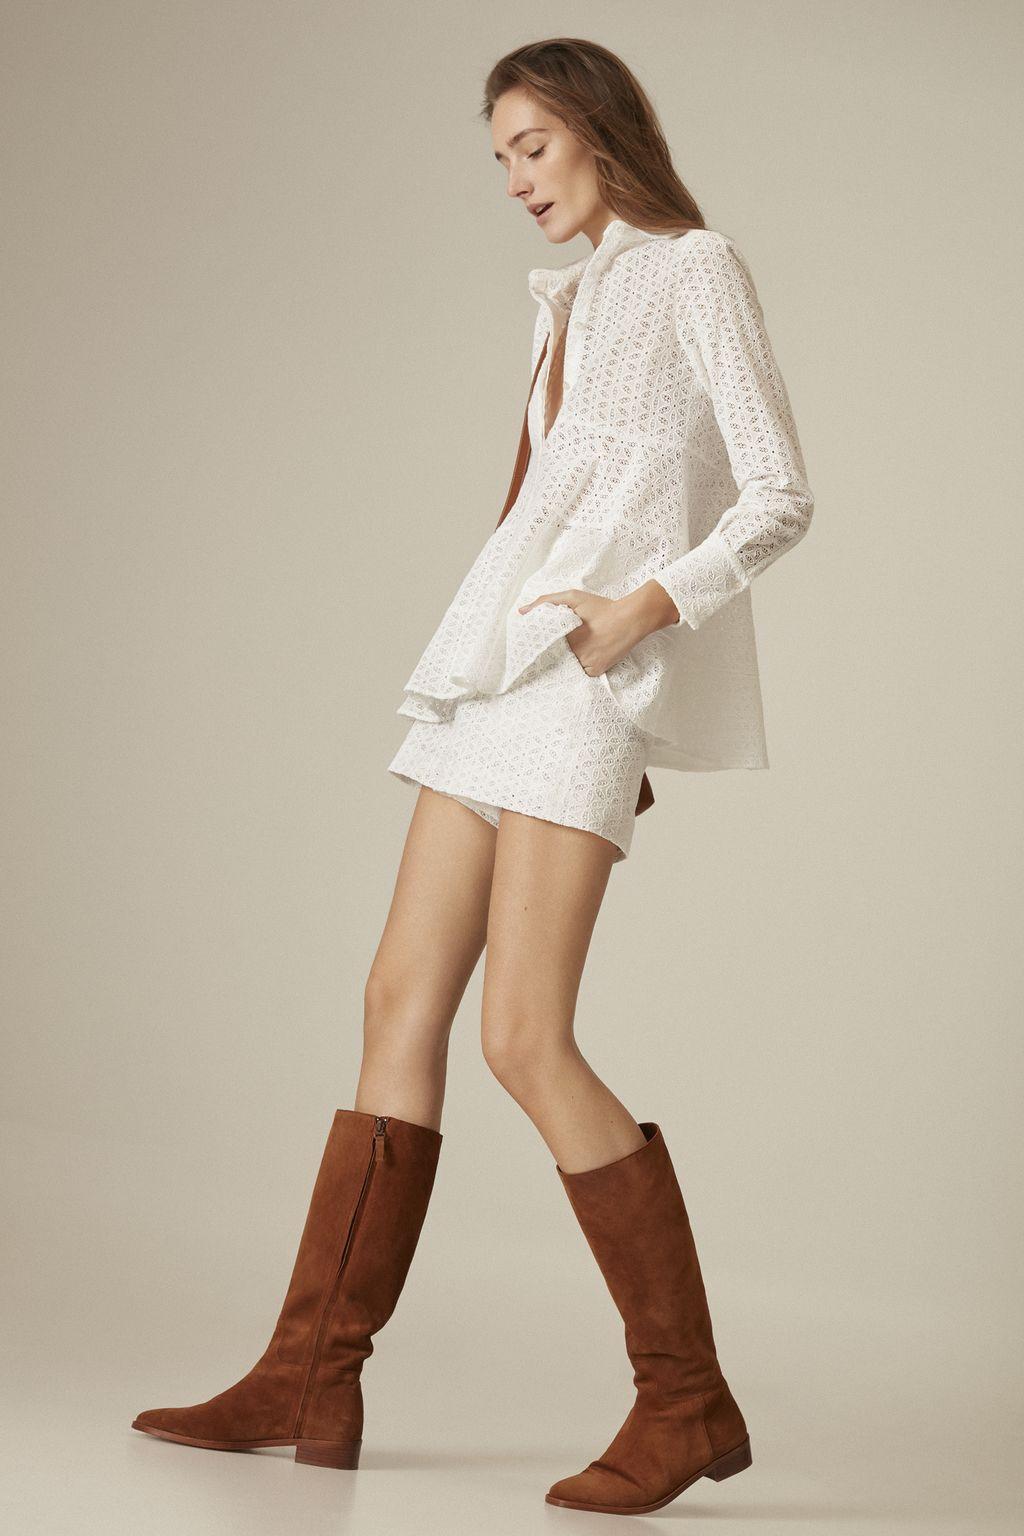 Perforated cotton bermuda shorts